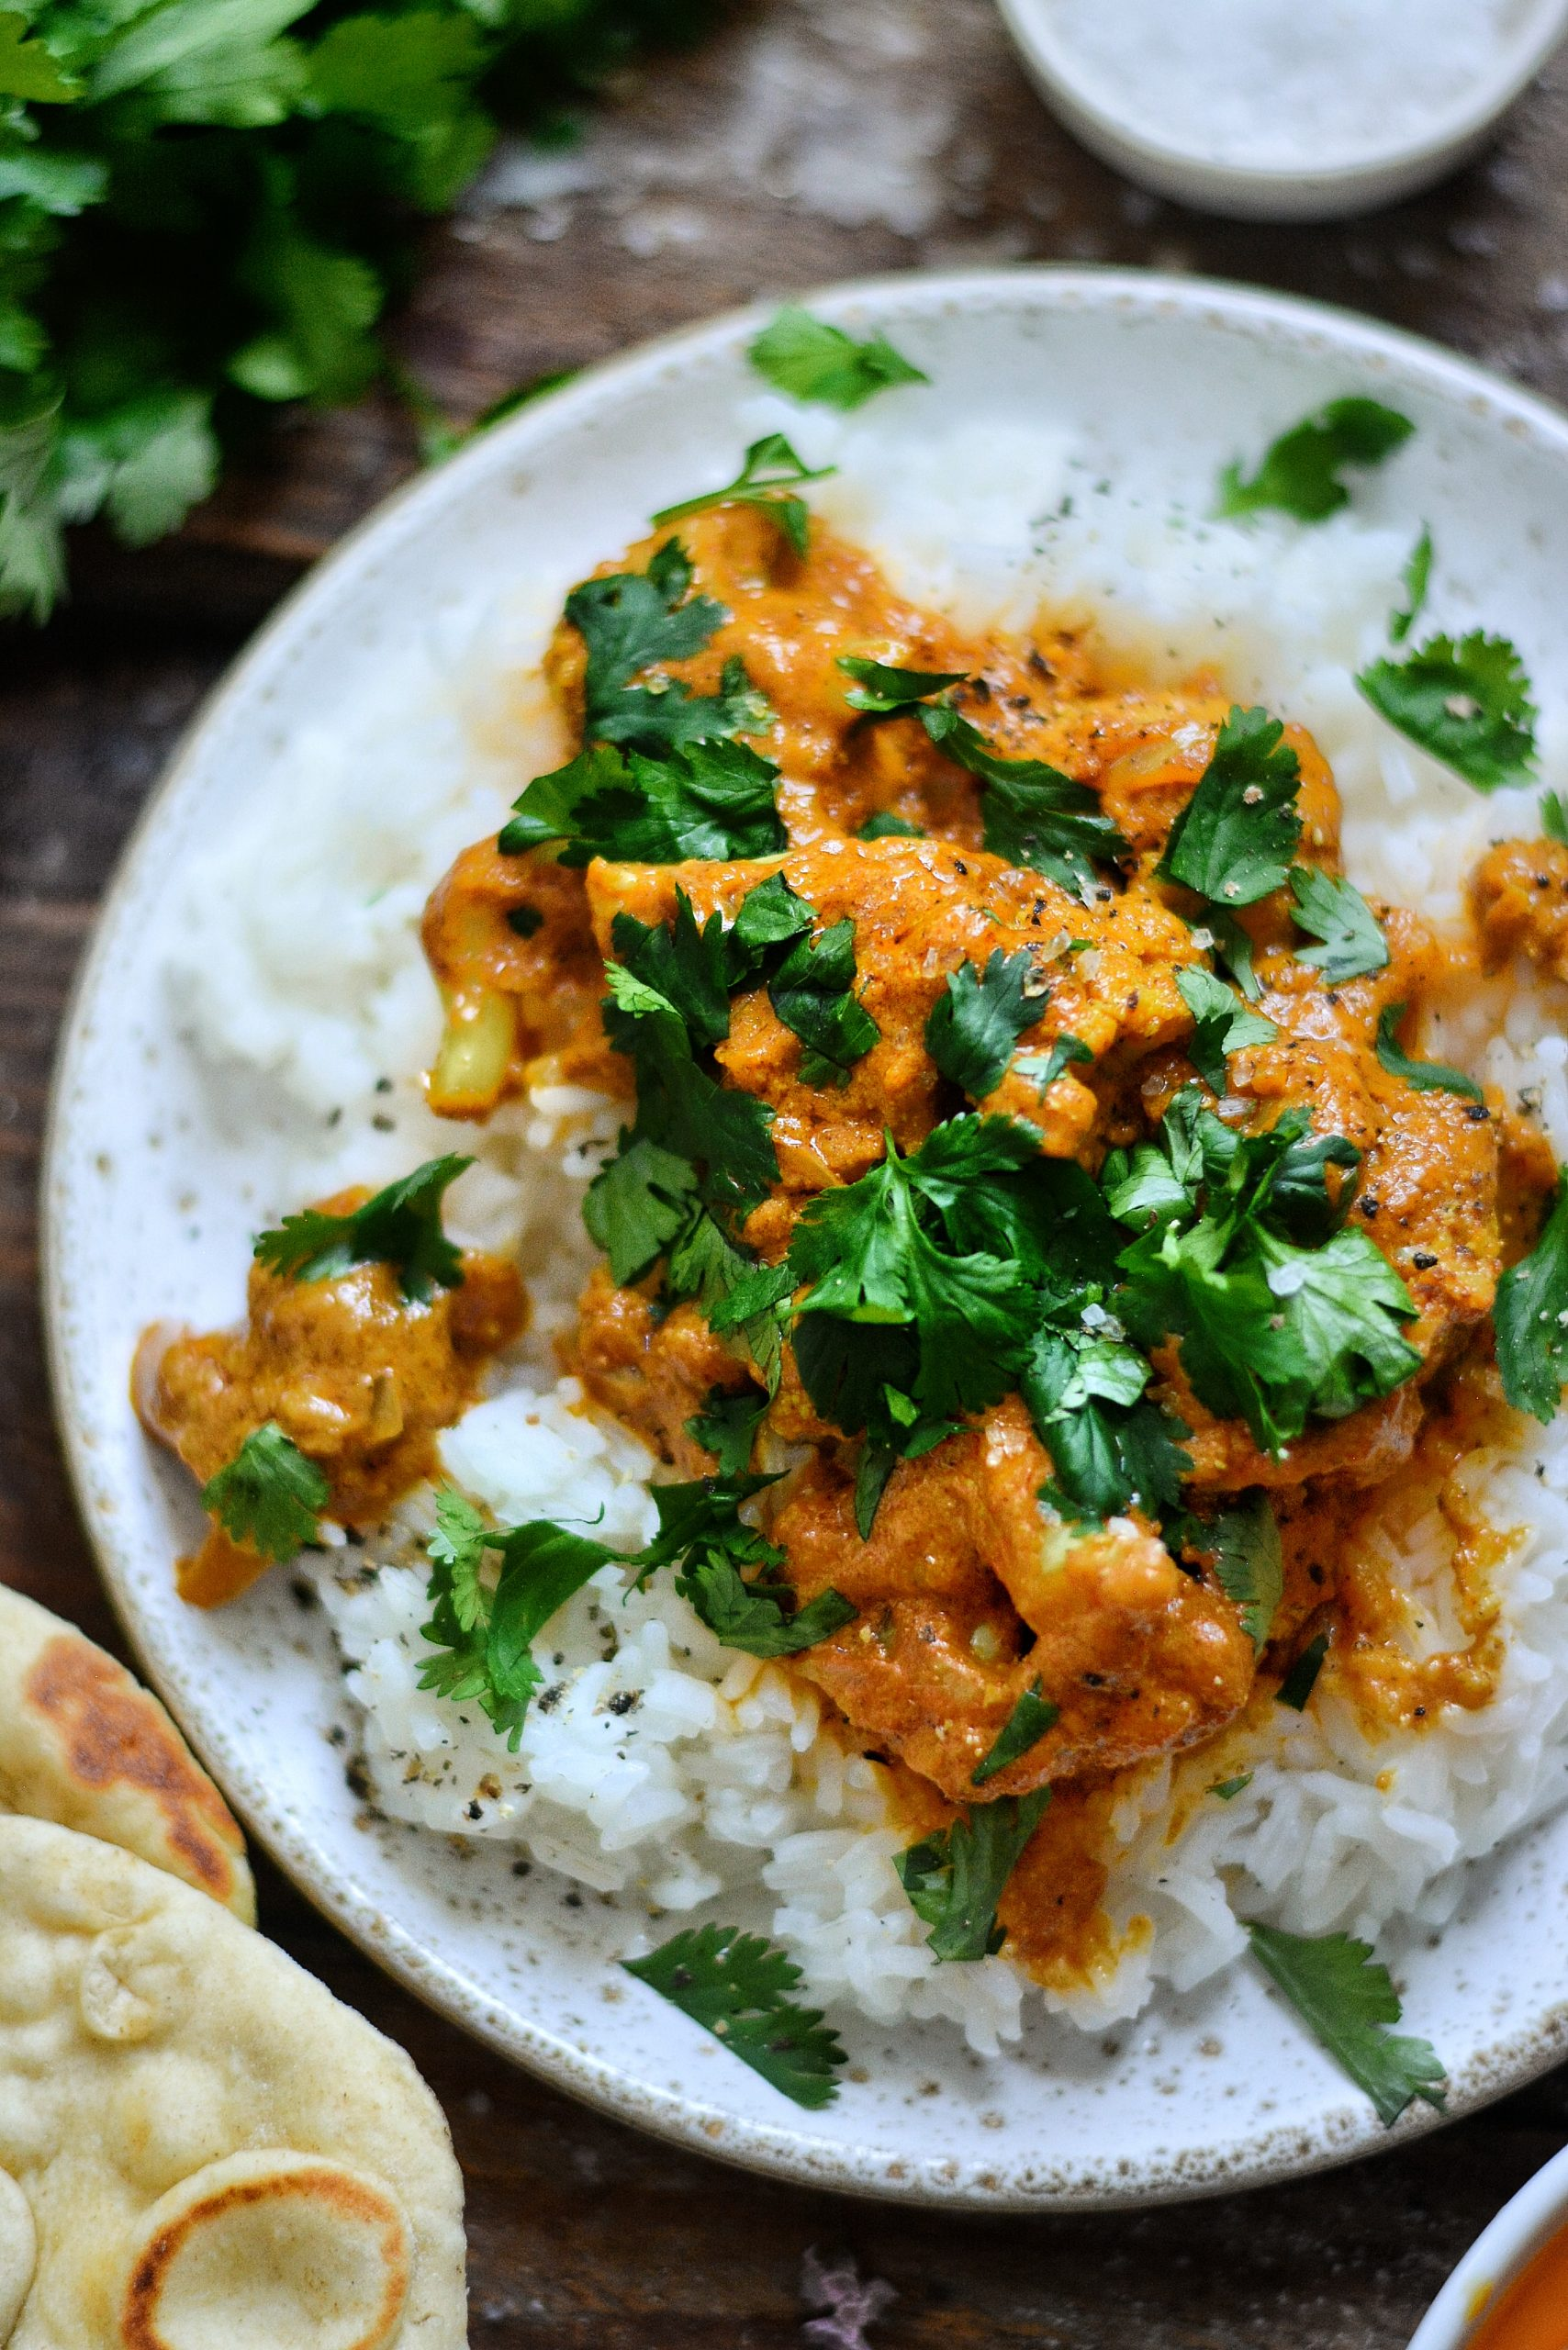 Curry Indien Vegan au Chou-Fleur / Vegan Indian Cauliflower Curry